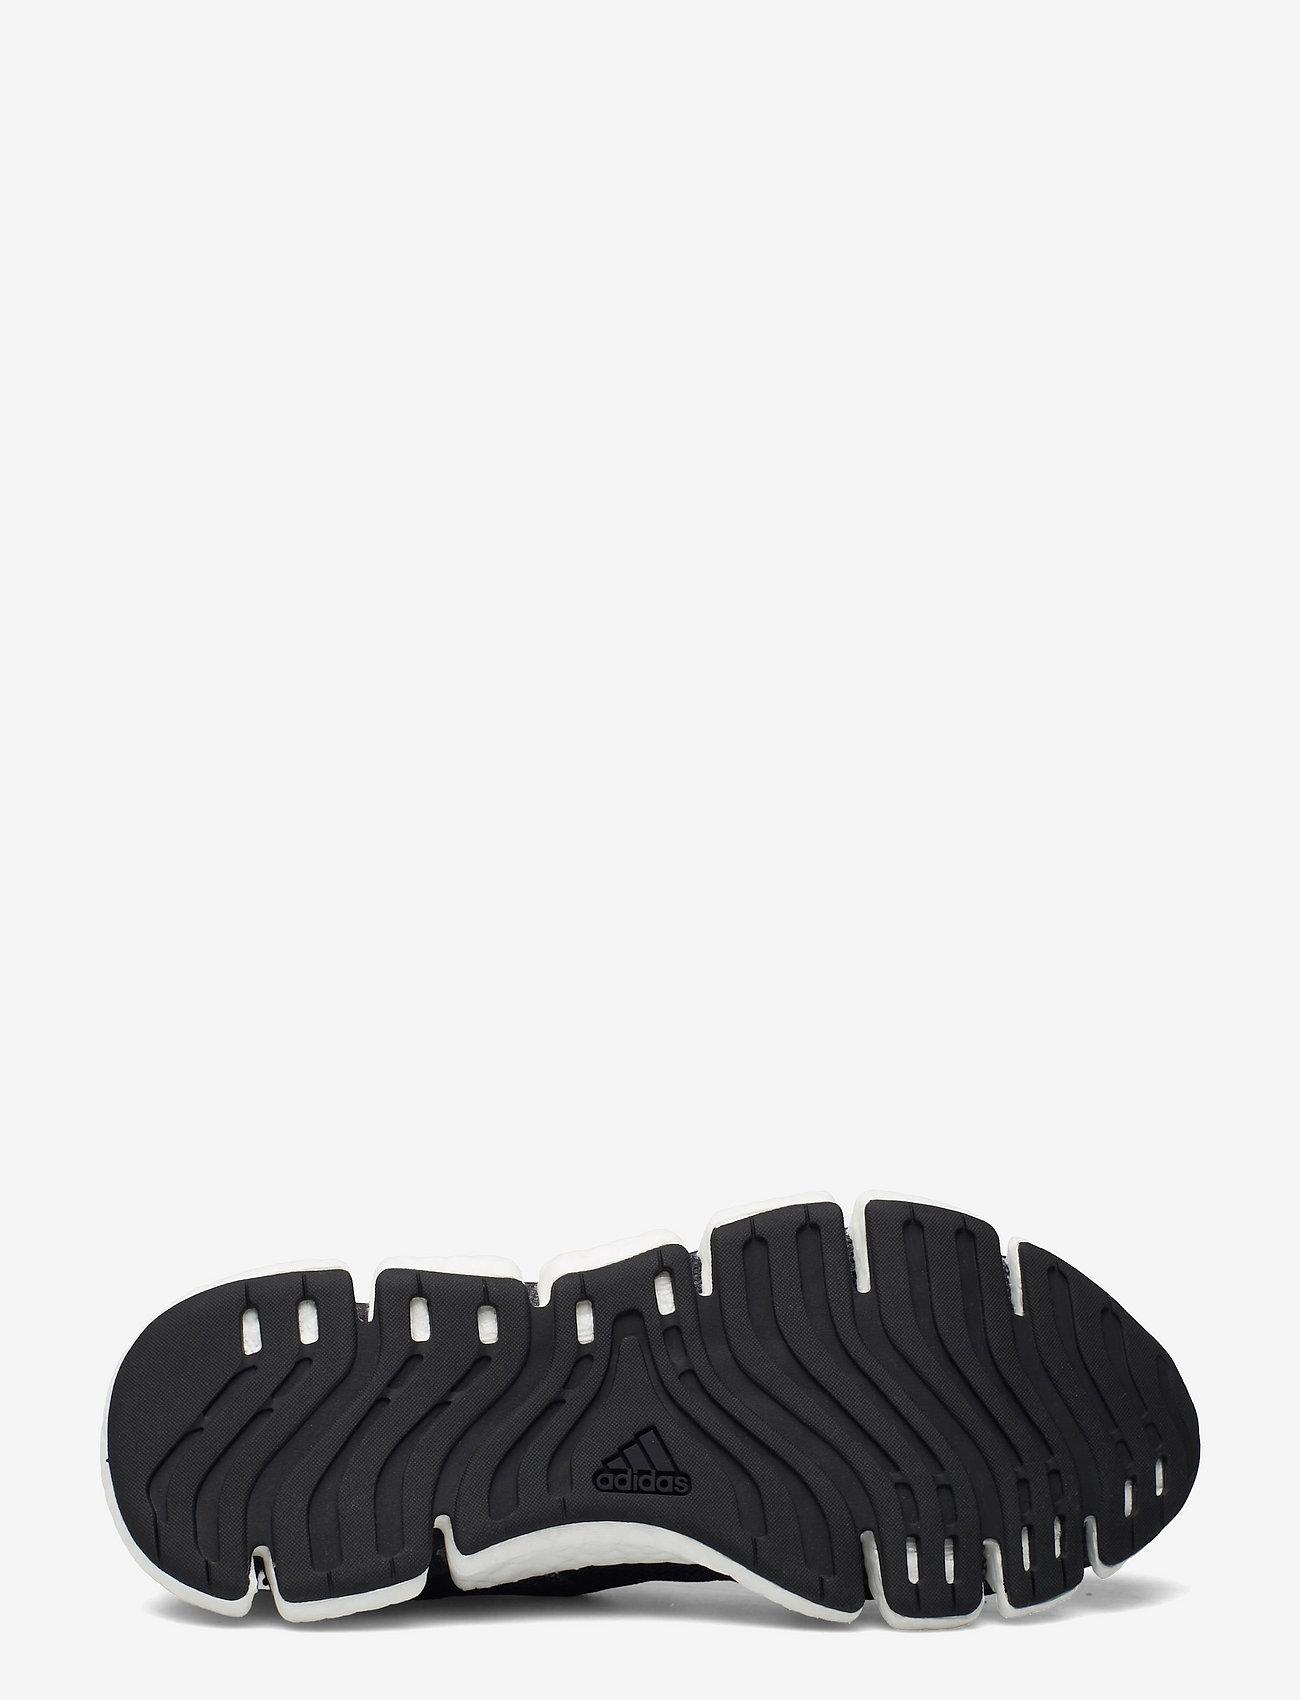 adidas by Stella McCartney - Vento W - chunky sneakers - ftwwht/aciyel/cblack - 4